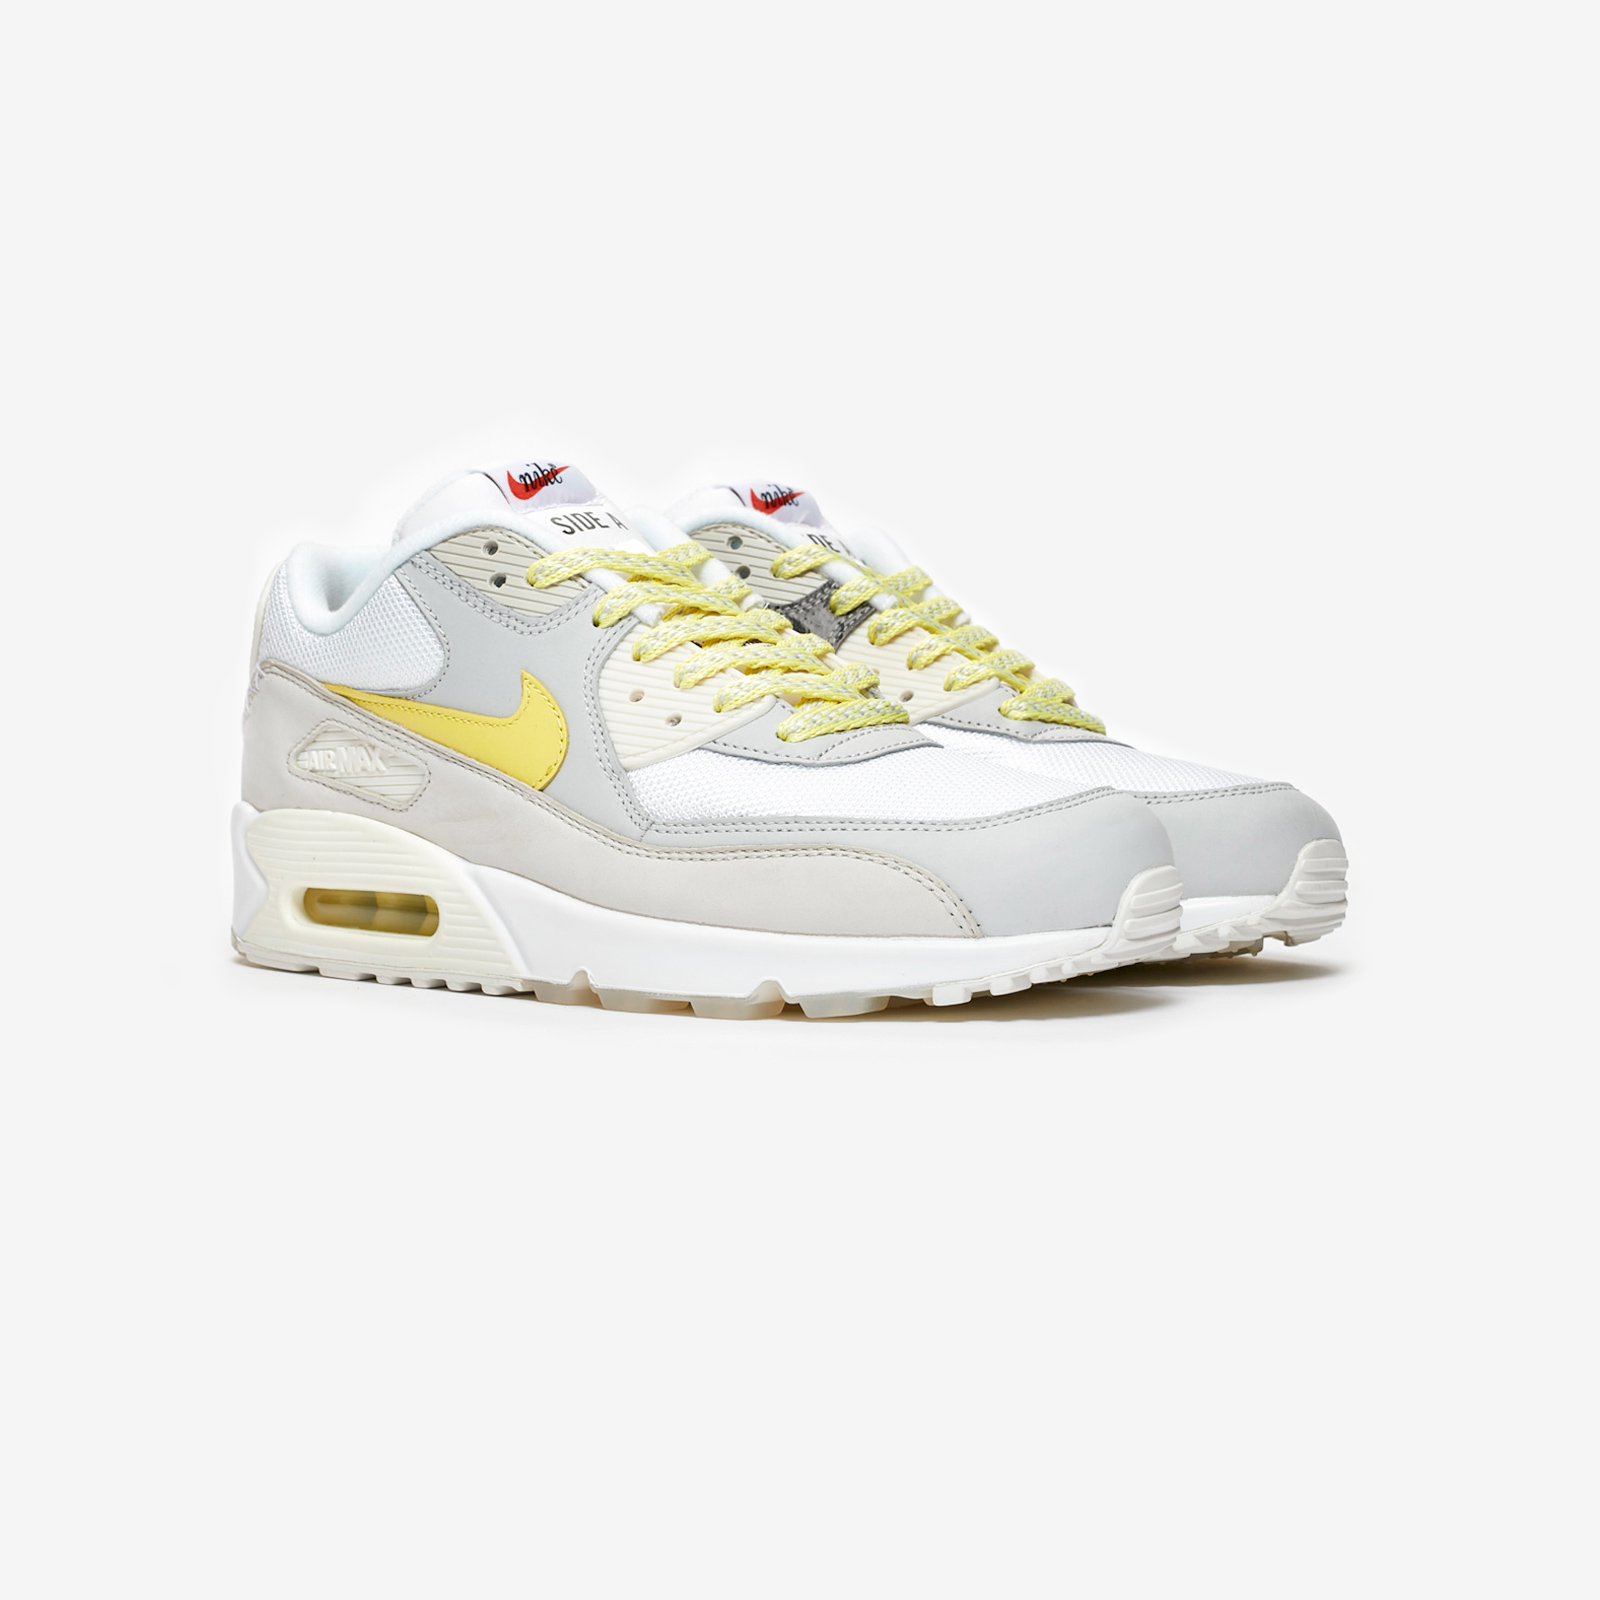 "Nike Air Max 90 Premium ""Side A"" - Ci6394-100 - SNS | sneakers ..."